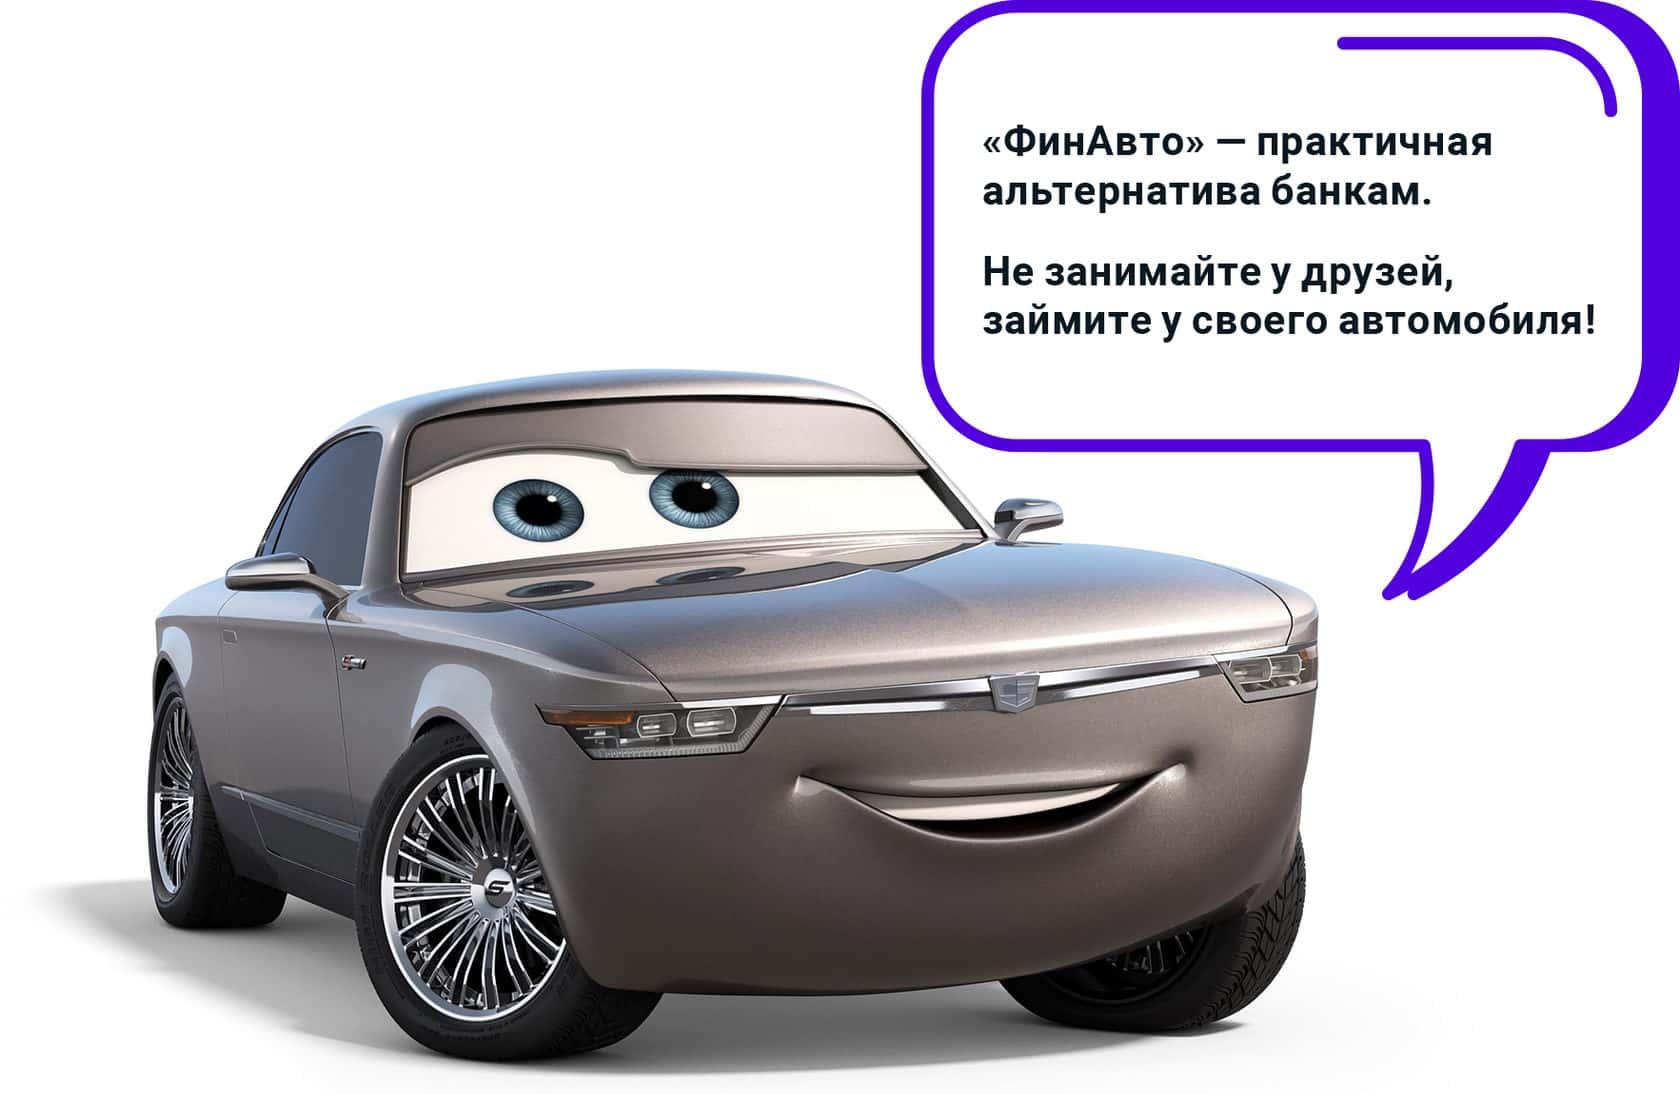 Машину под залог птс казань автоломбард алматы продажа автомобилей